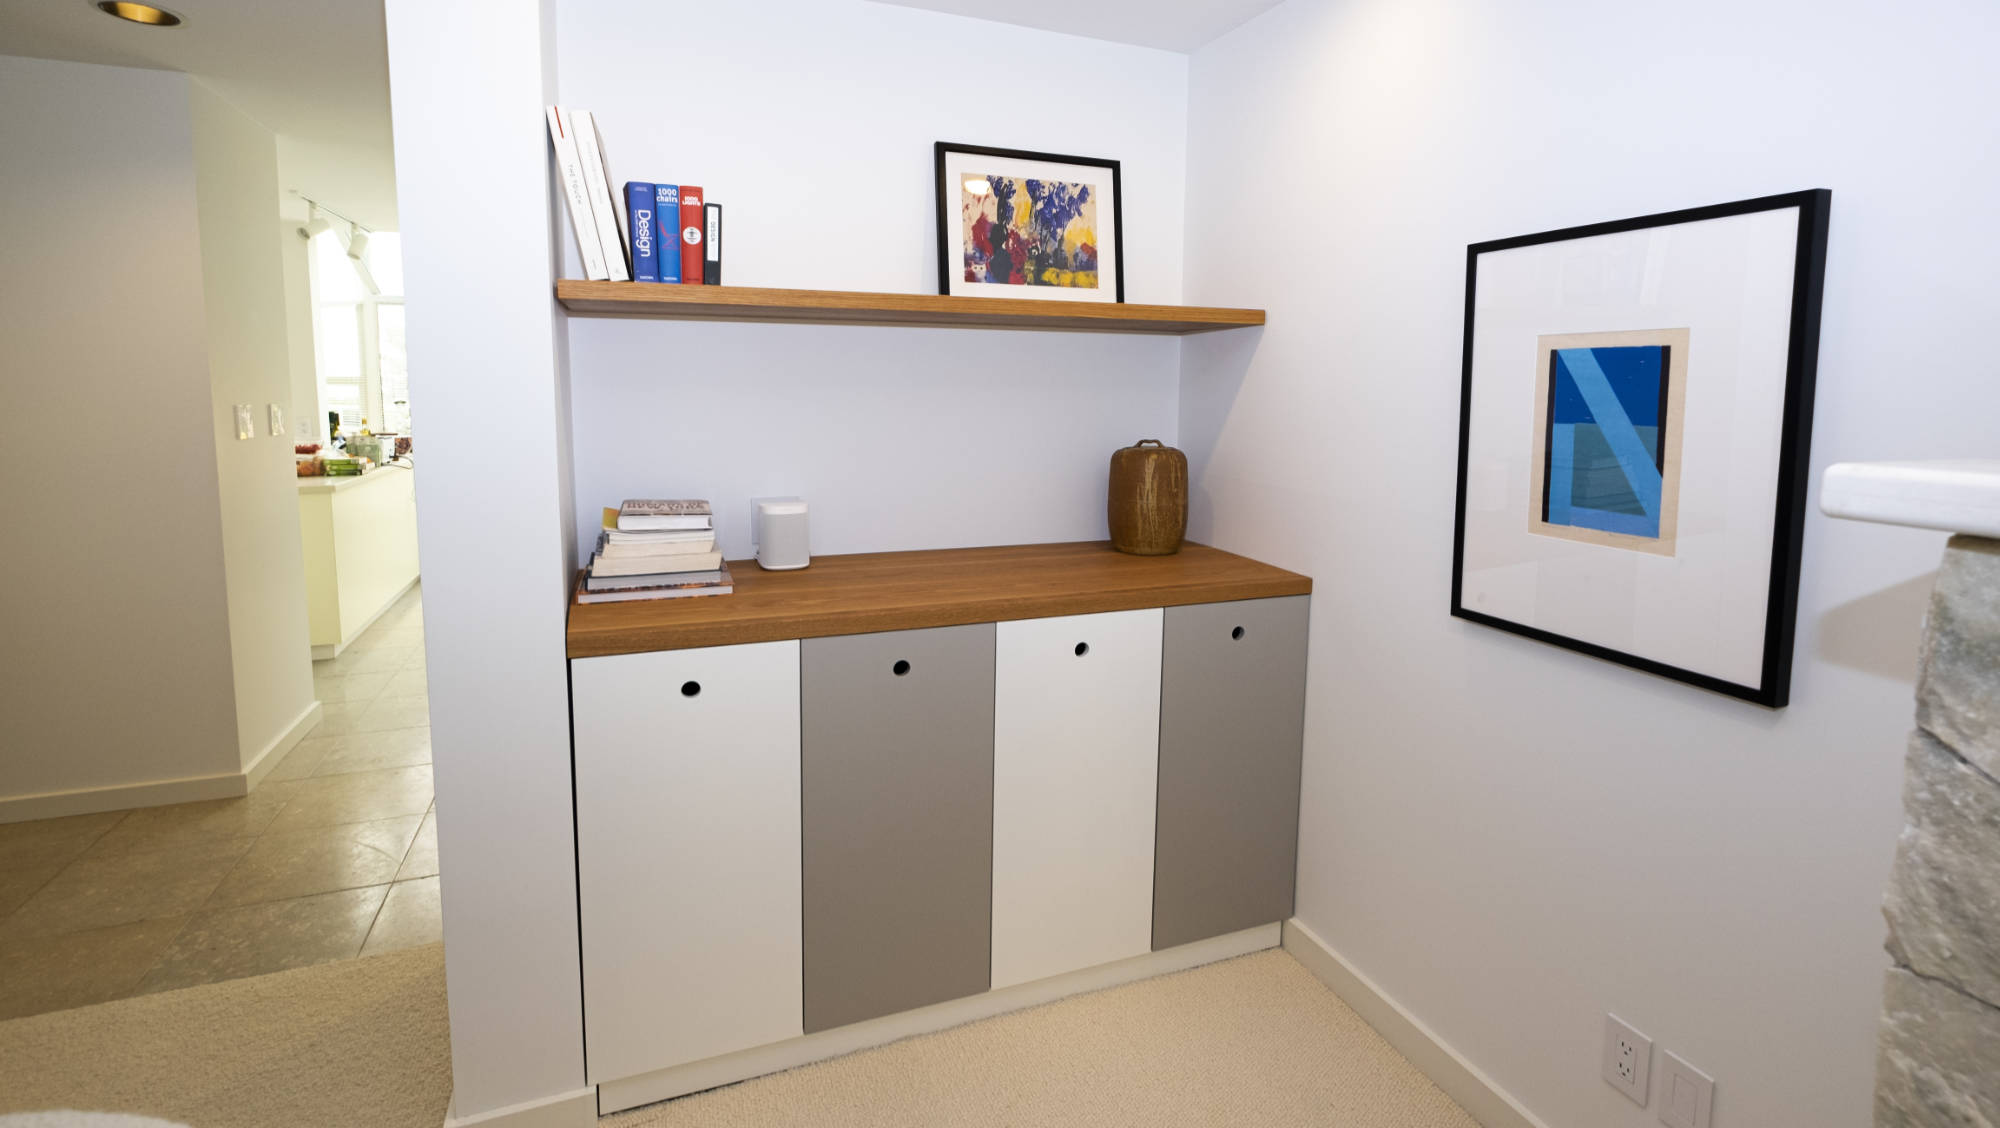 Built in wooden cabinet